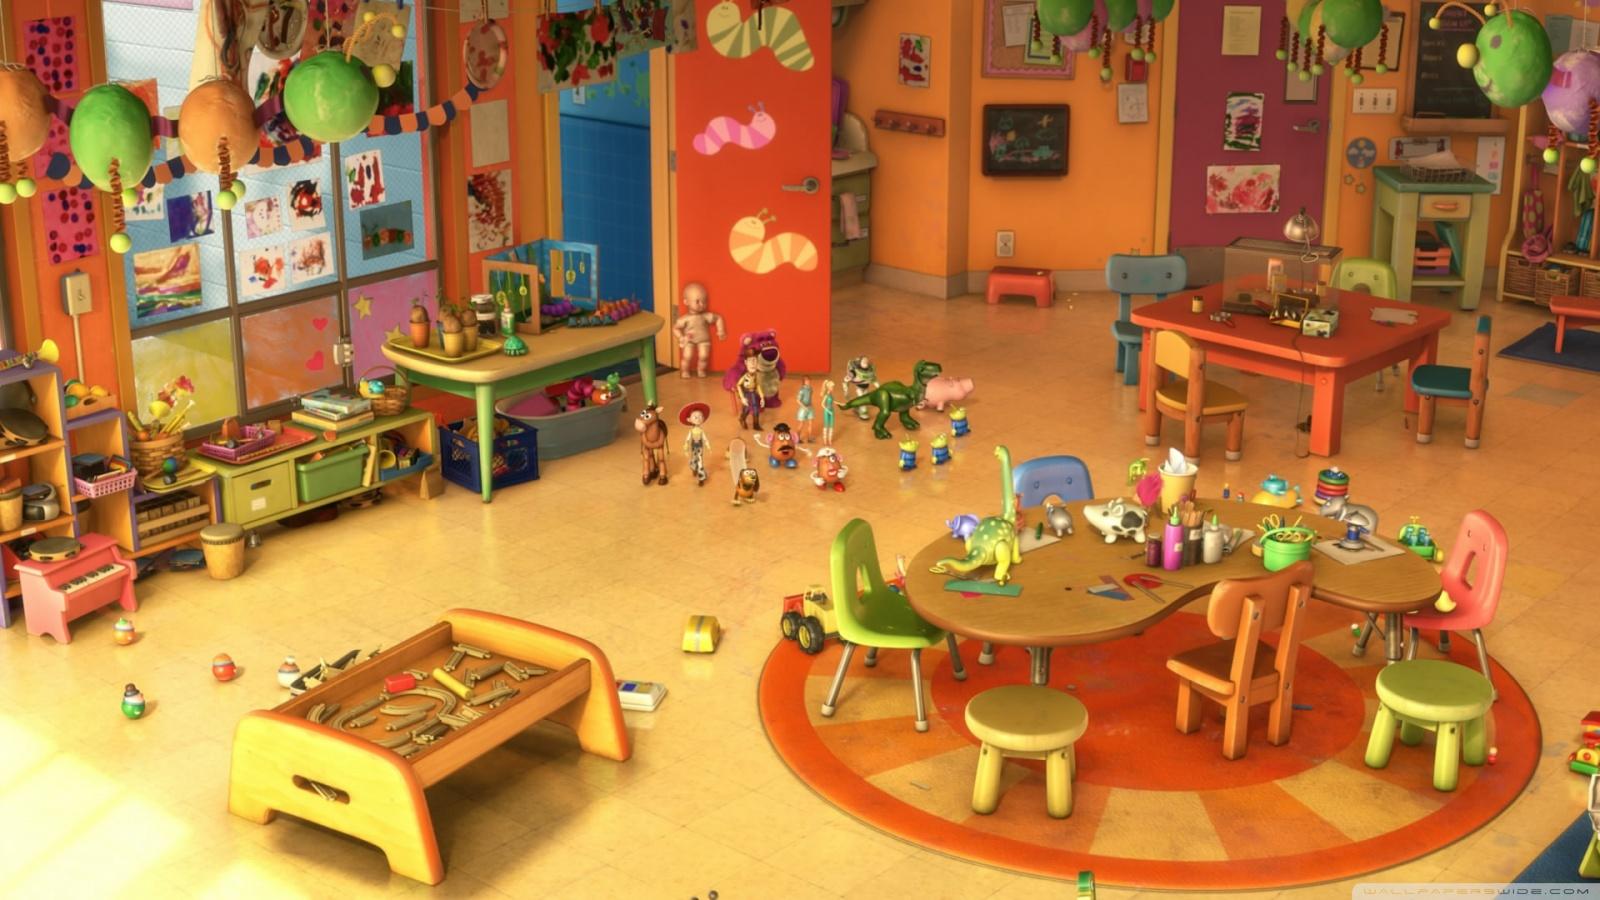 Kindergarten Wallpapers PC 1QWWOGB Wallperiocom 1600x900